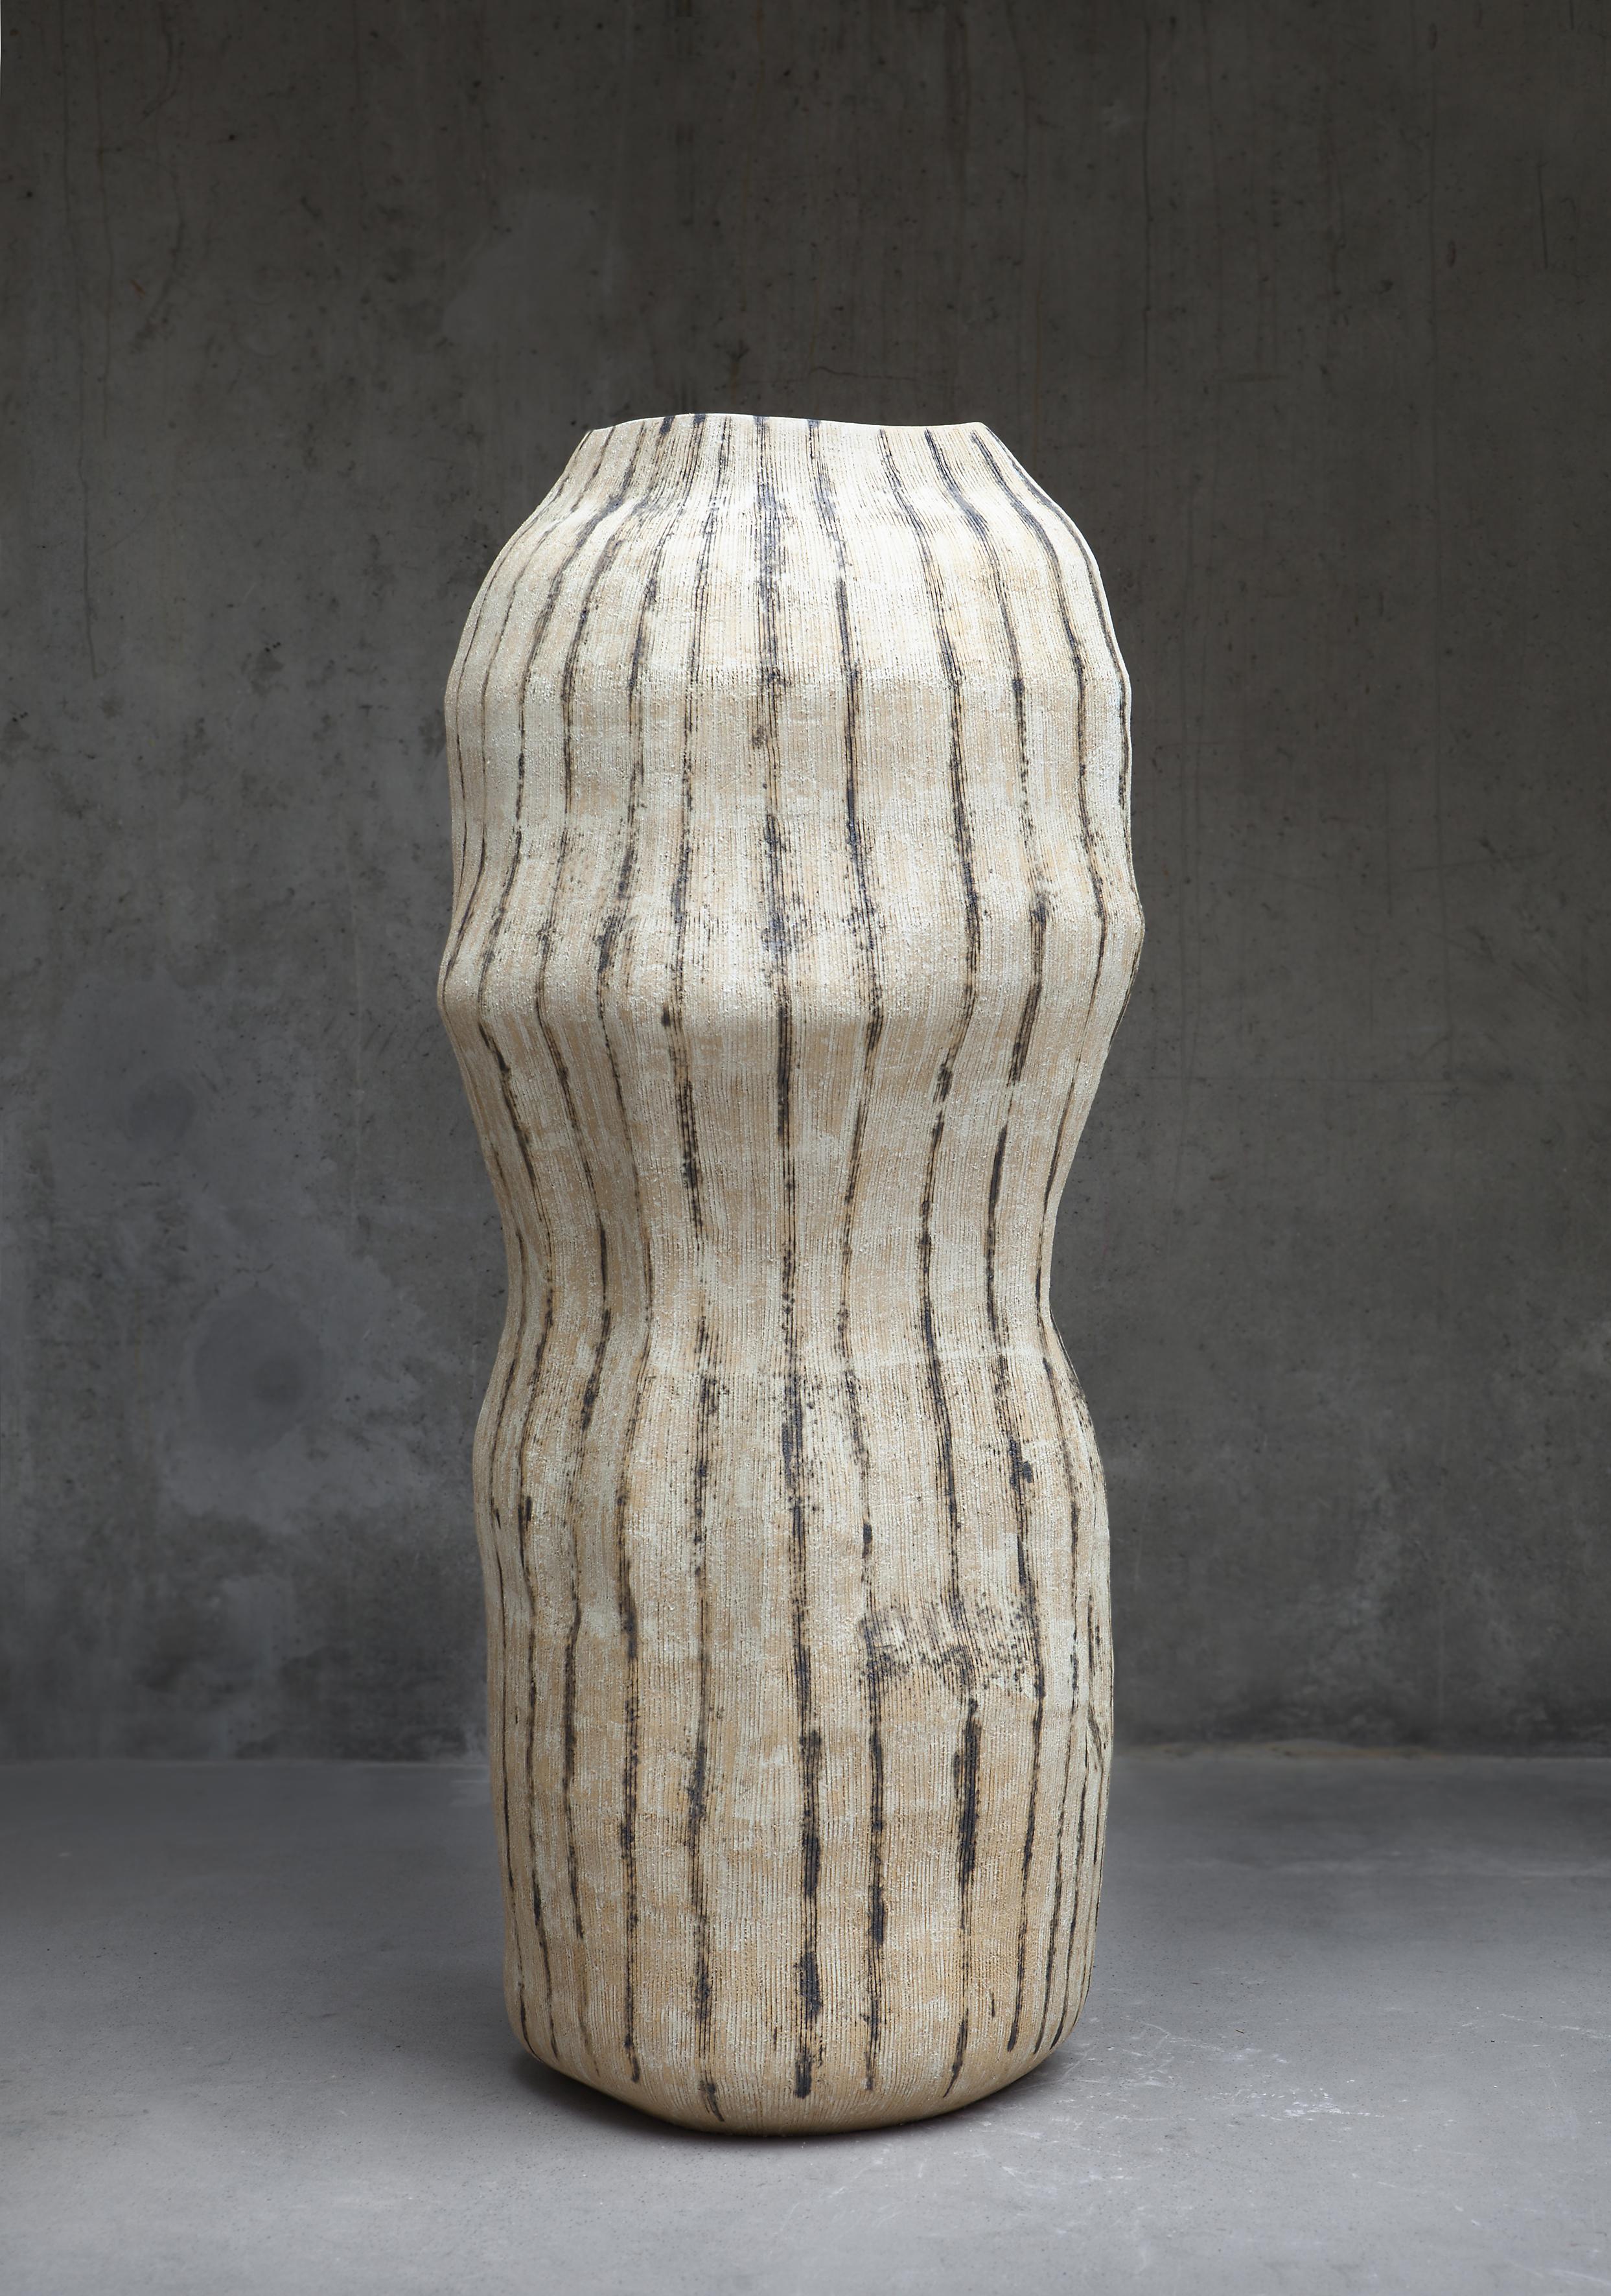 Qaa I , 2018 | Handbuilt/coiled stoneware, Hans Coper glaze with titanium oxide and copper oxide  Photo credit: Chikako Harada